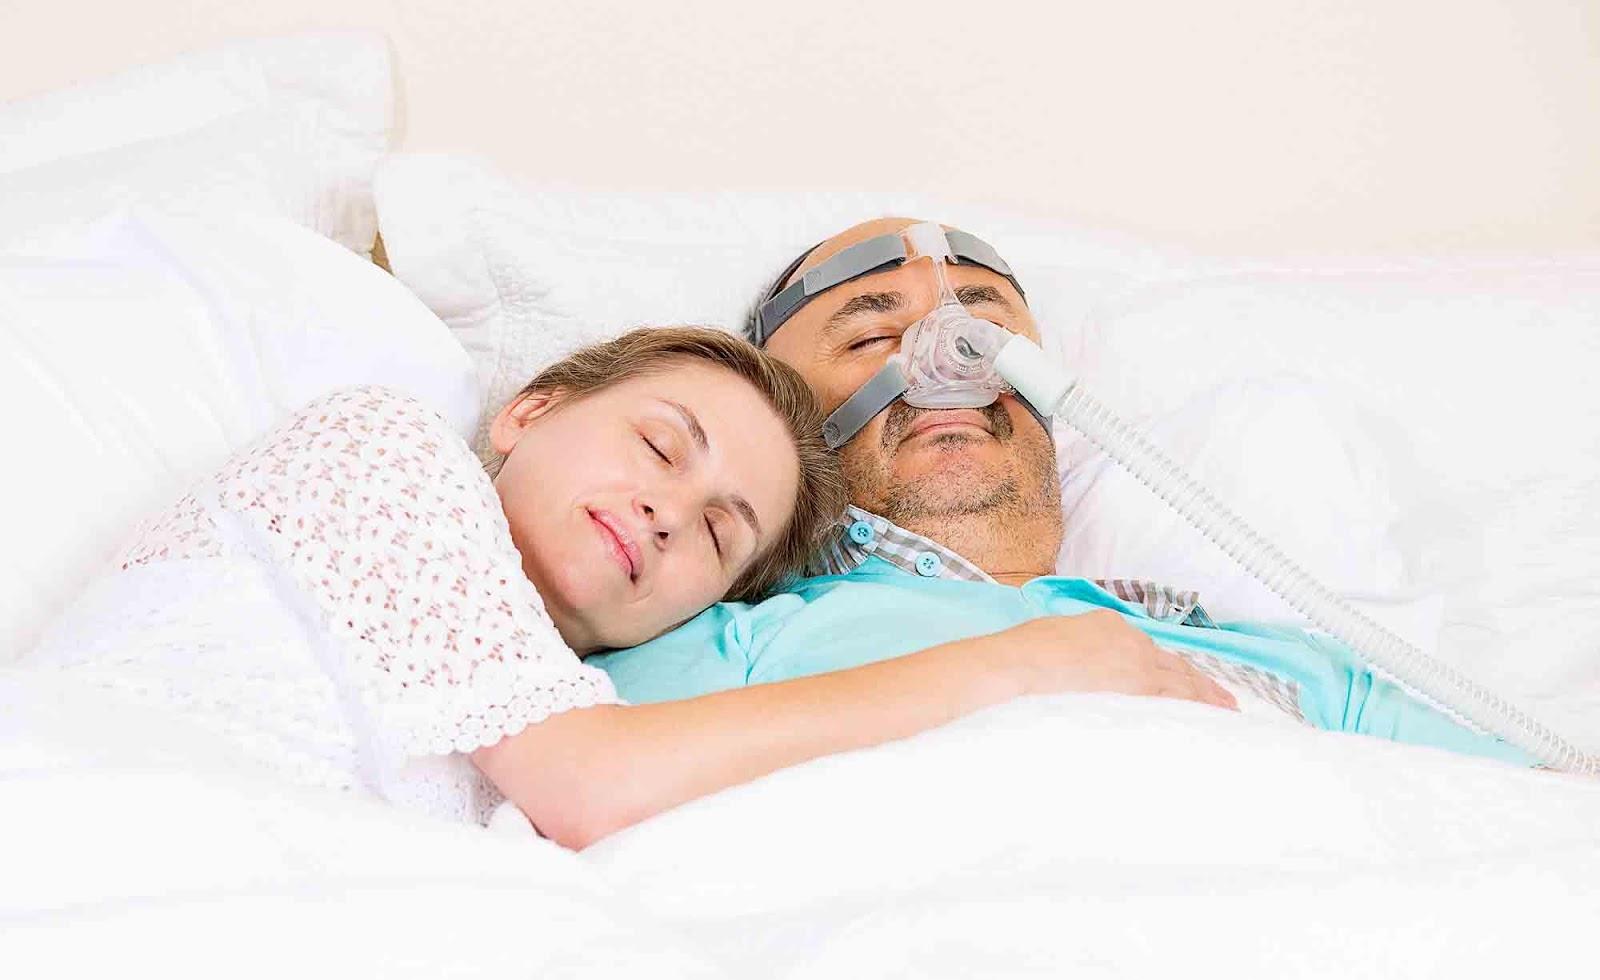 aparelho para parar roncar mascara nasal